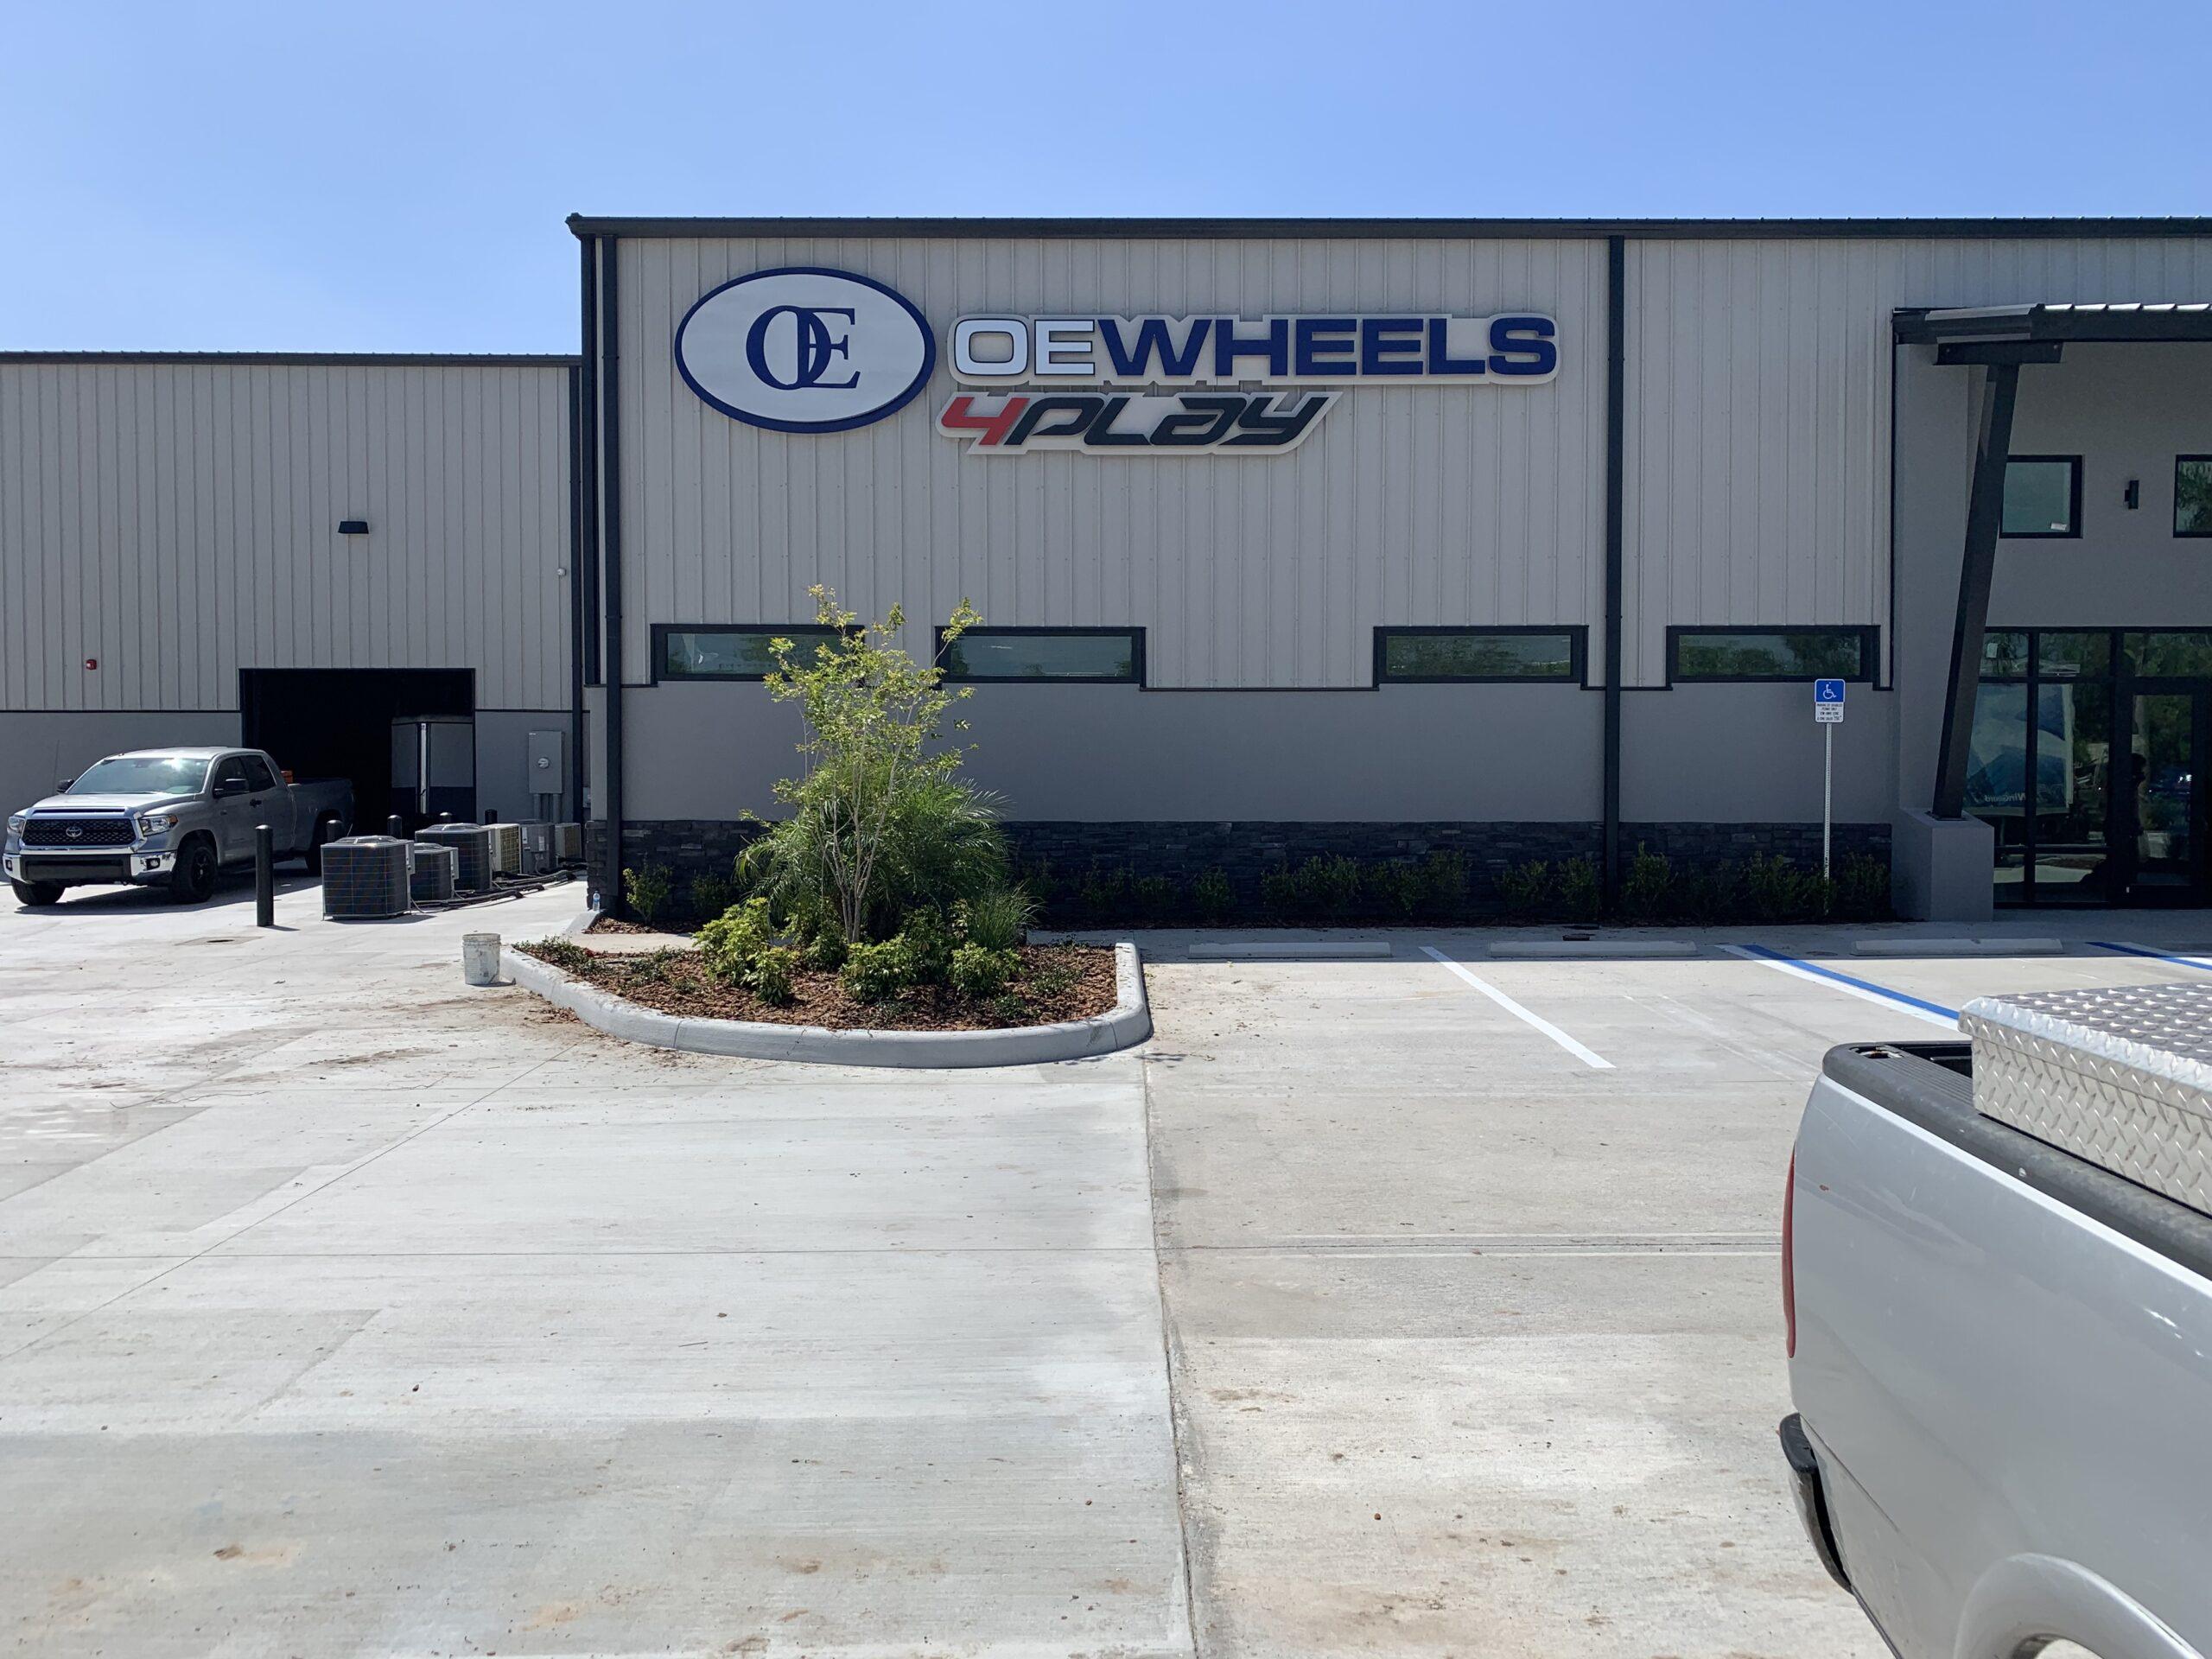 OE Wheels of Sarasota outside reverse channel letter sign